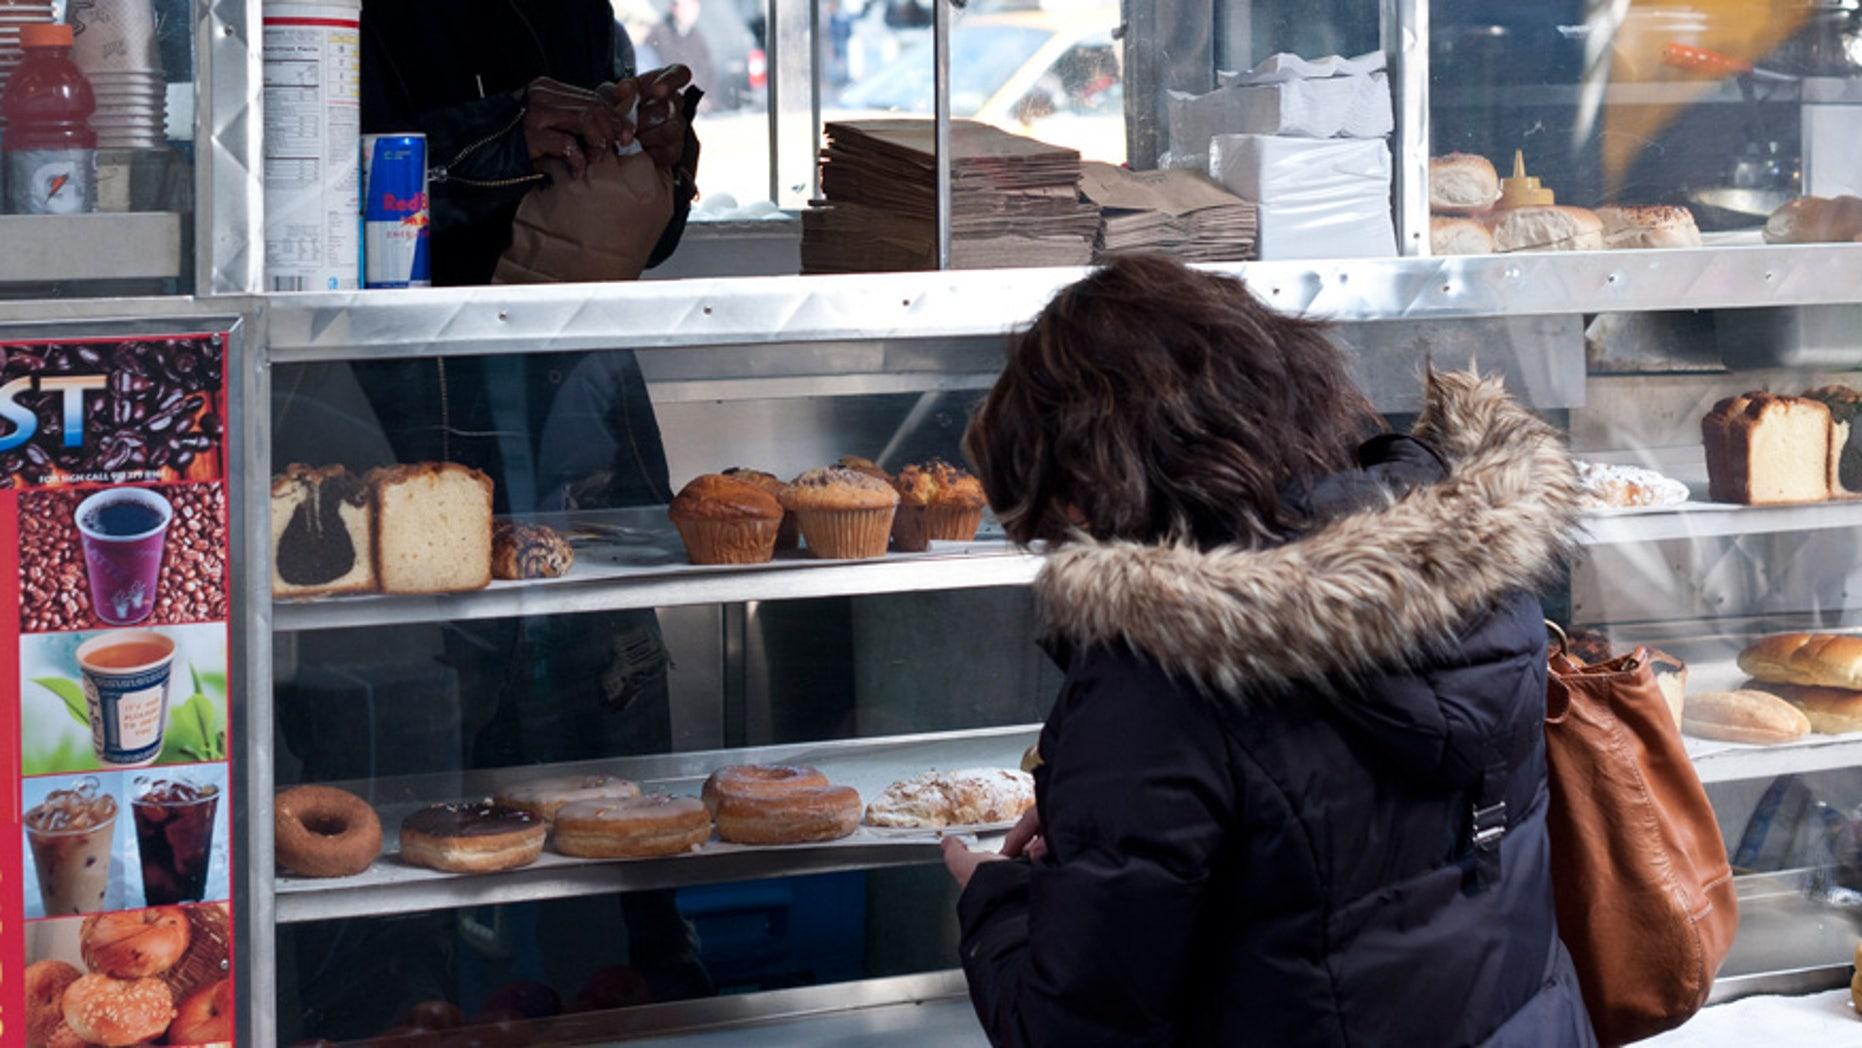 A vendor sells baked goods at a New York City food cart.